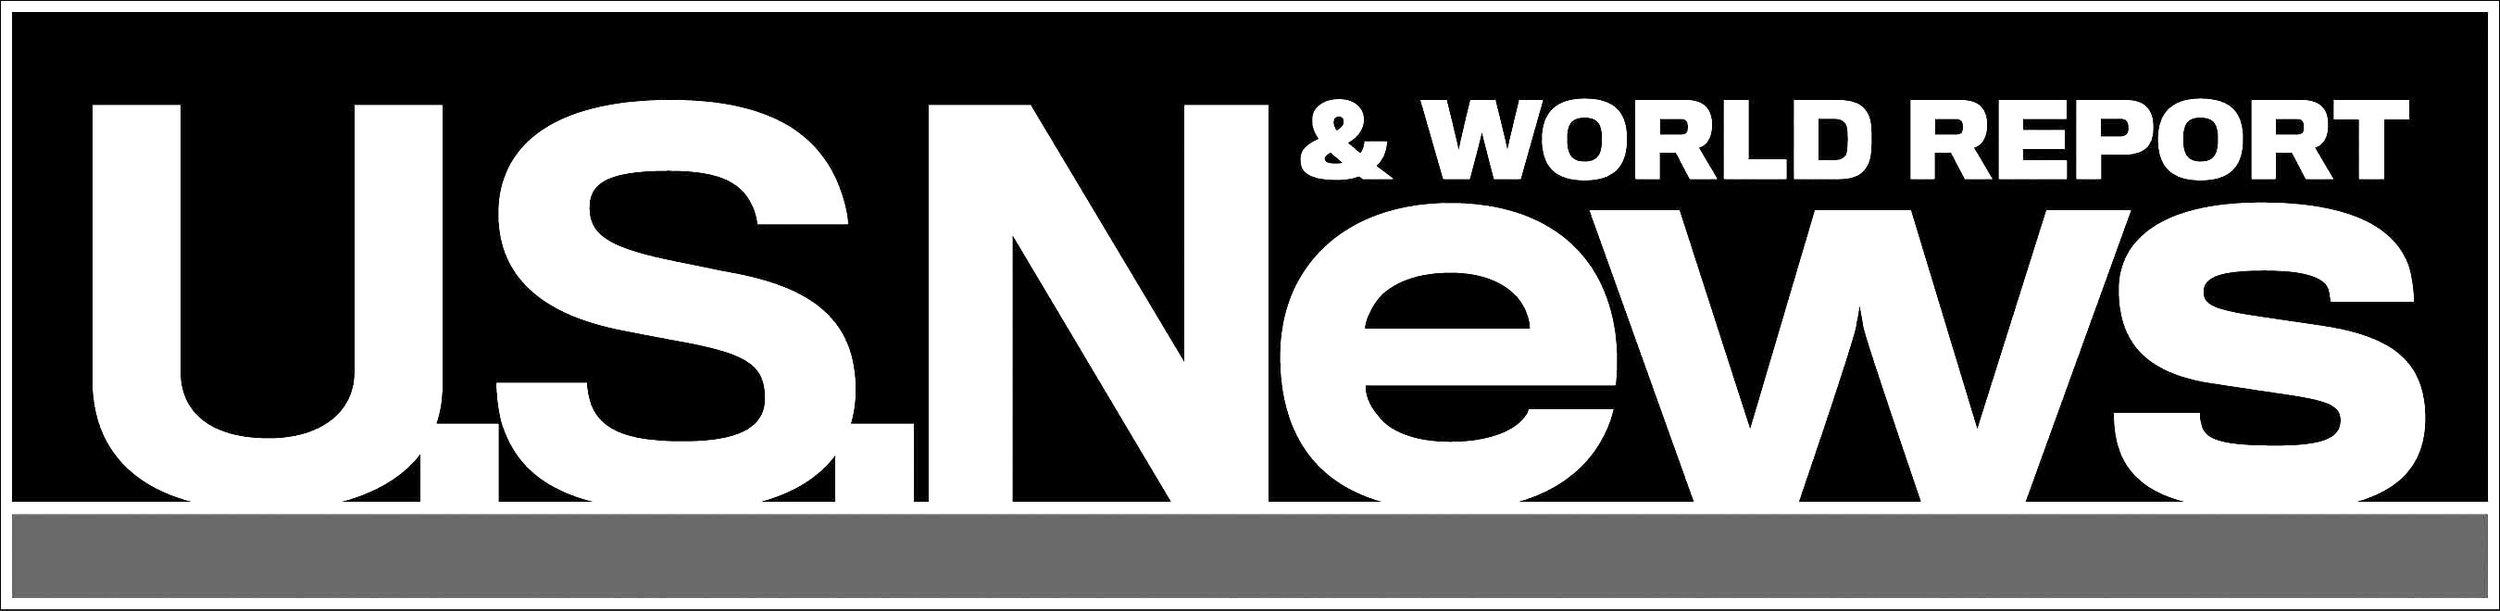 US-News-World-Report-logo.jpg